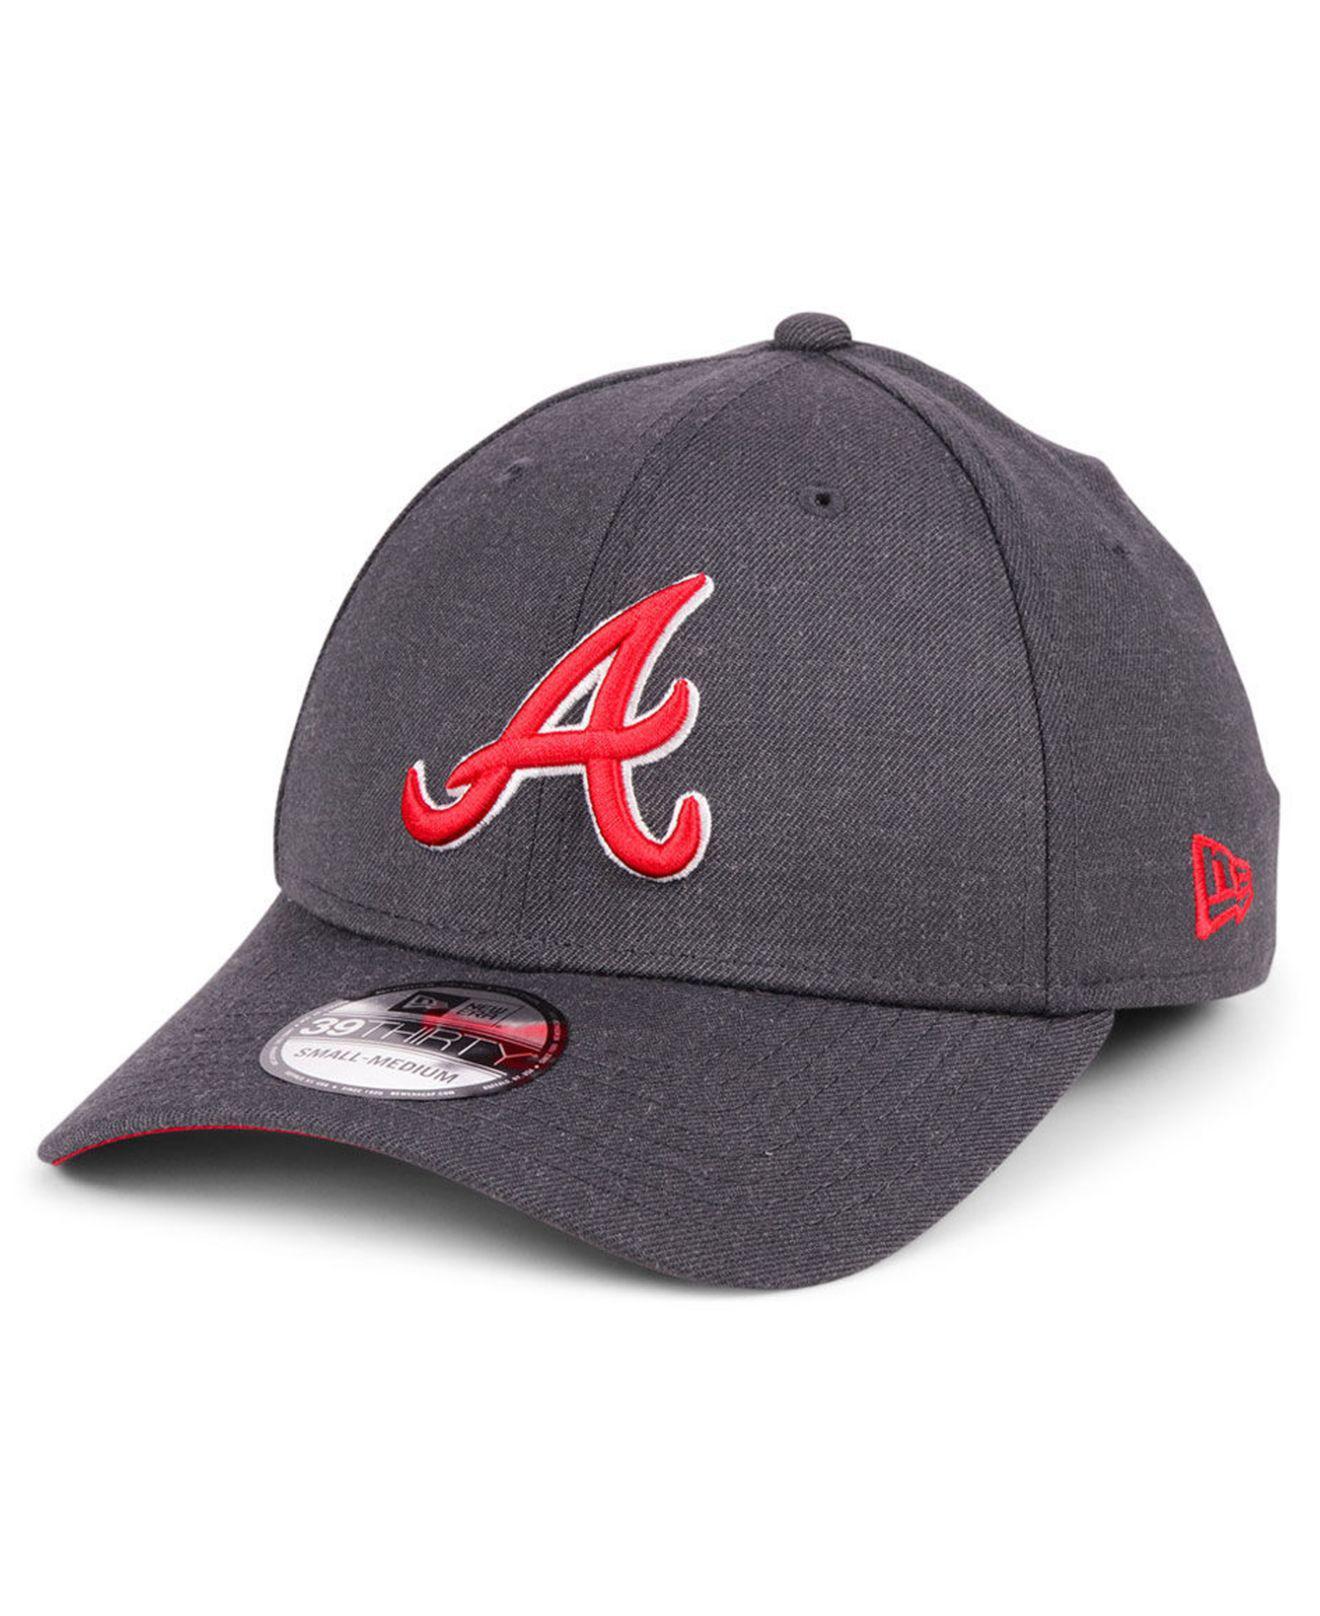 new products 27db5 026c8 KTZ. Men s Gray Atlanta Braves Charcoal Classic 39thirty Cap